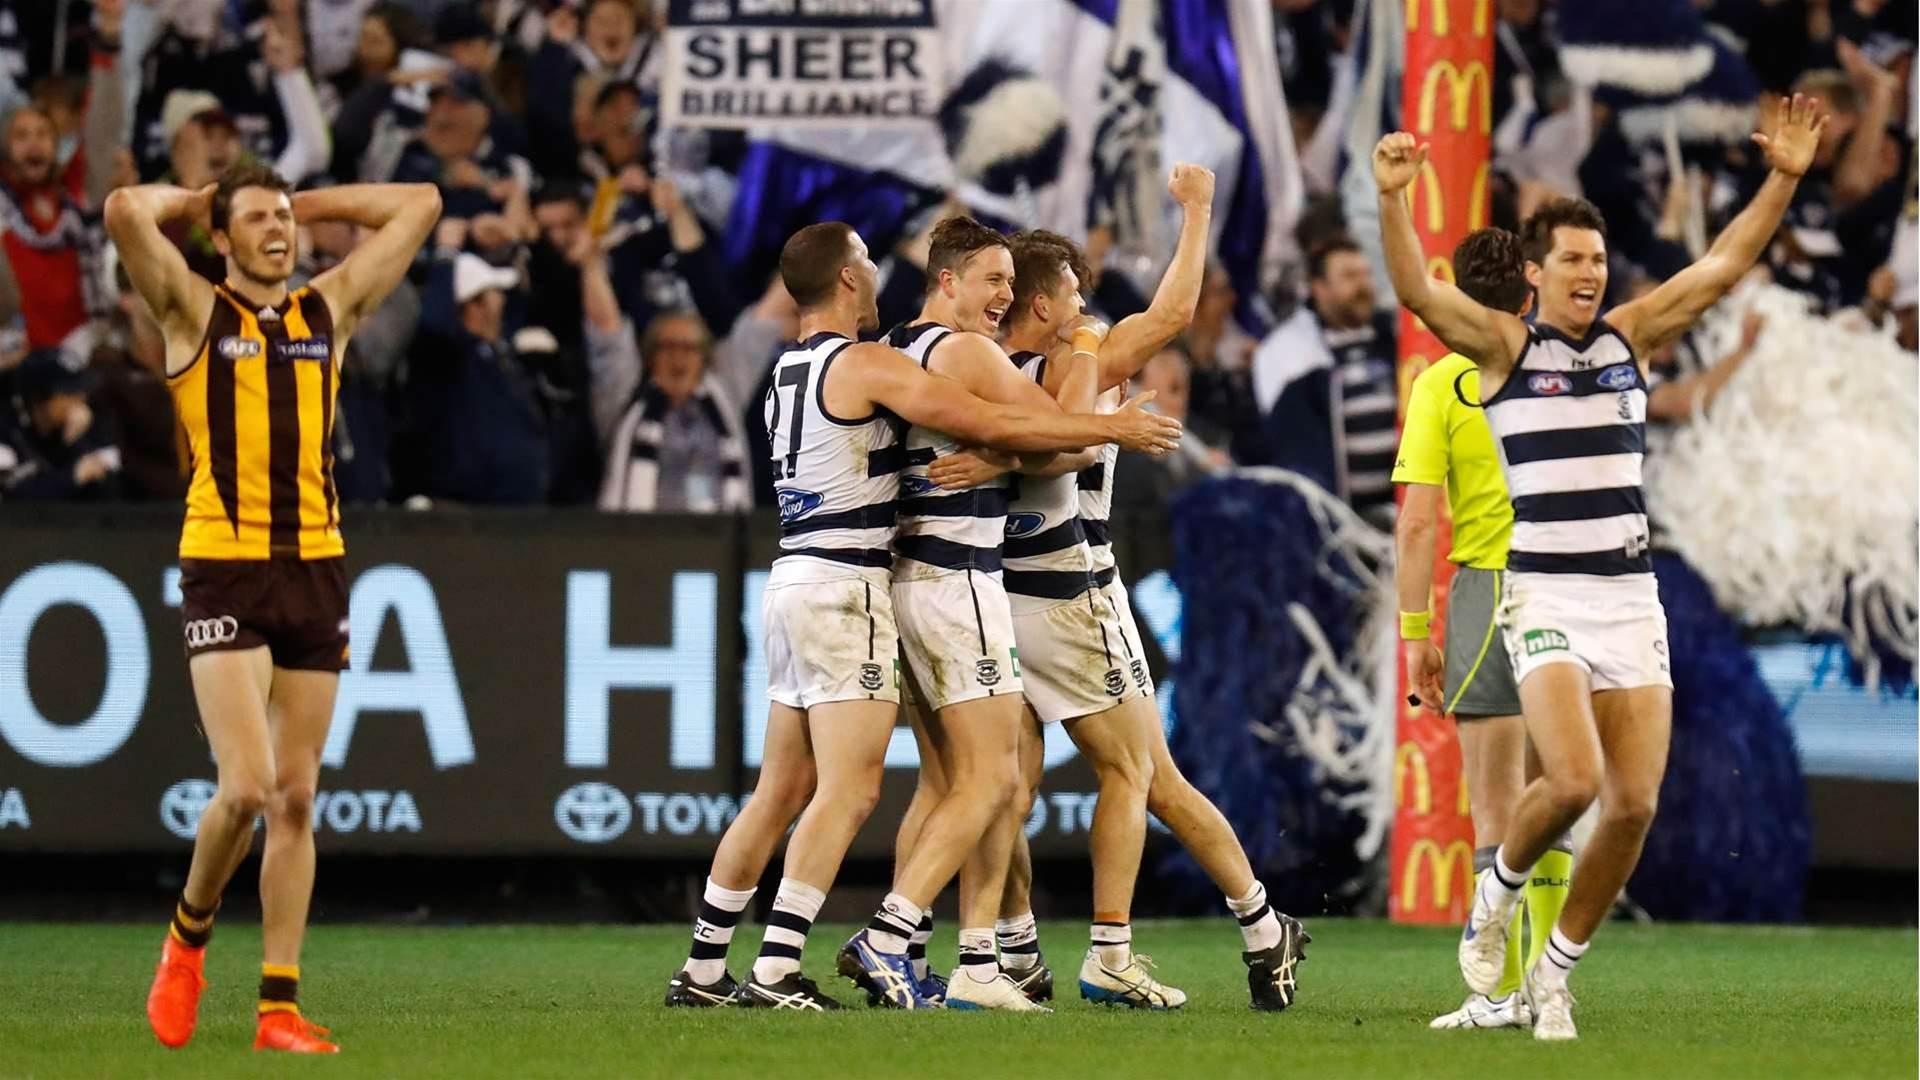 Catwalk to a premiership